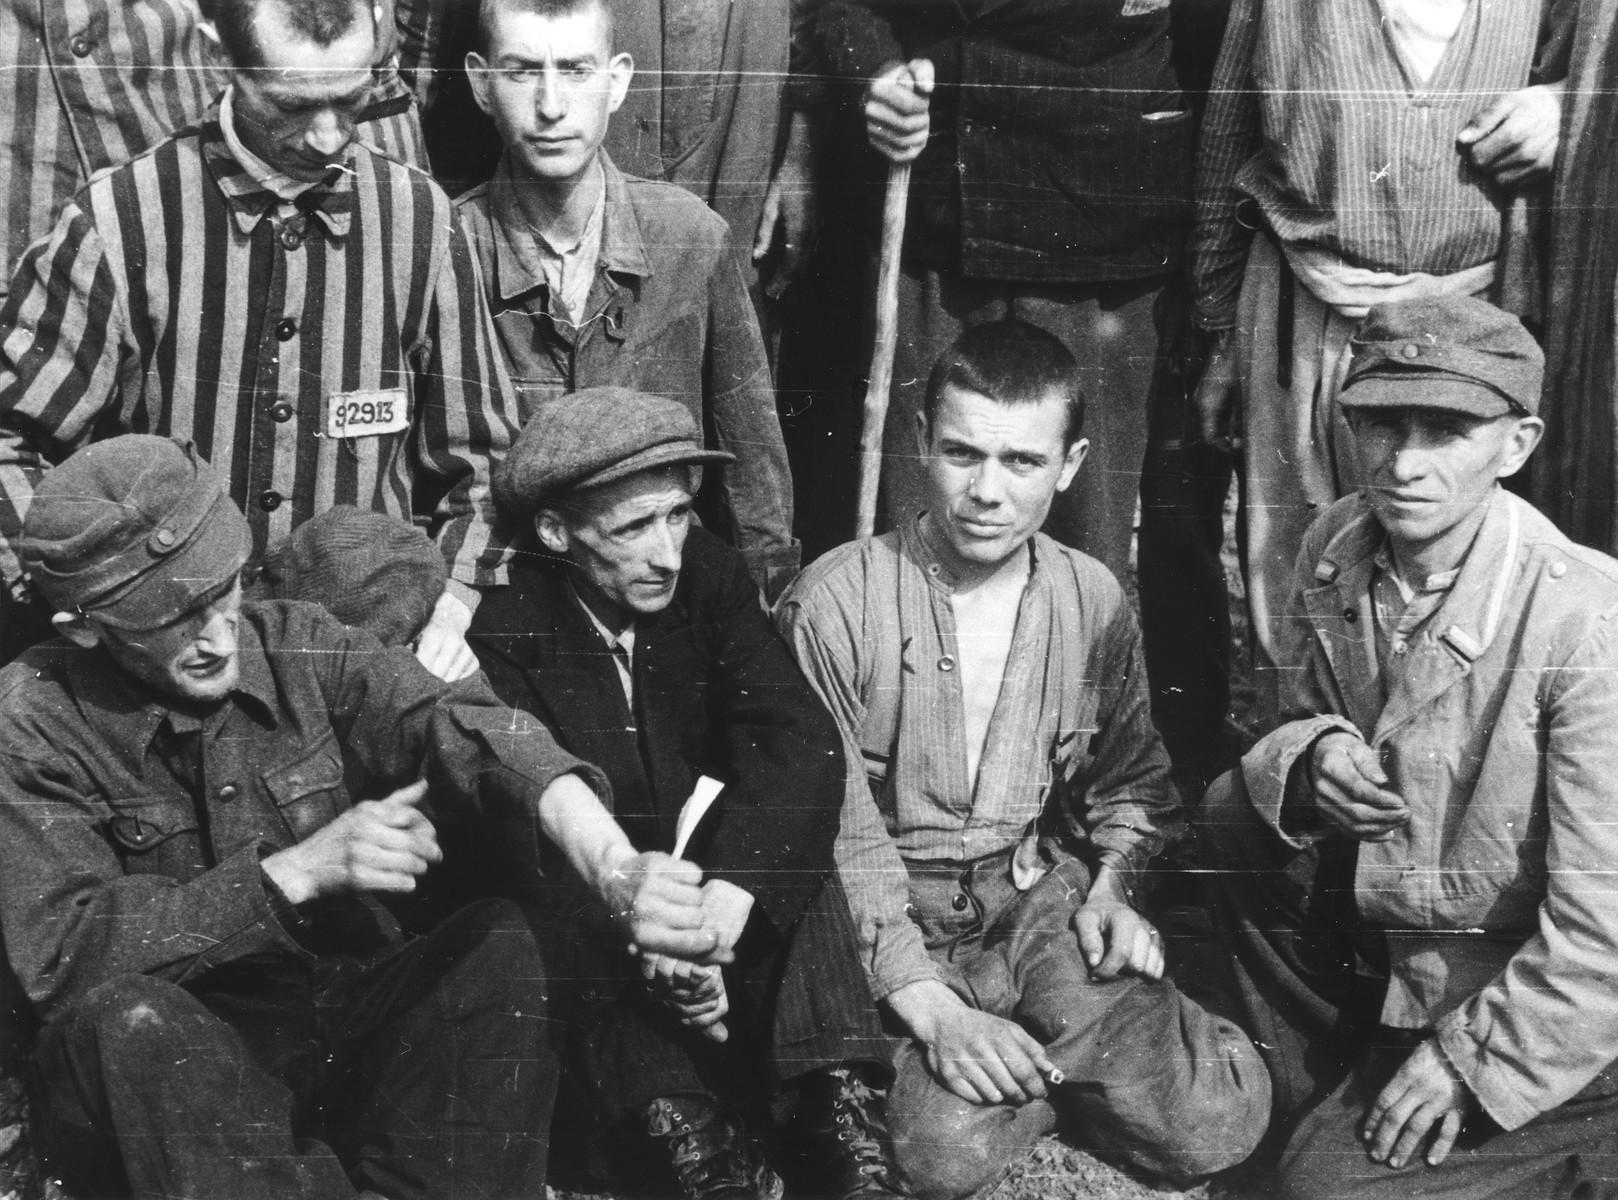 Group portrait of survivors in Langenstein-Zwieberge, a sub-camp of Buchenwald, soon after liberation.